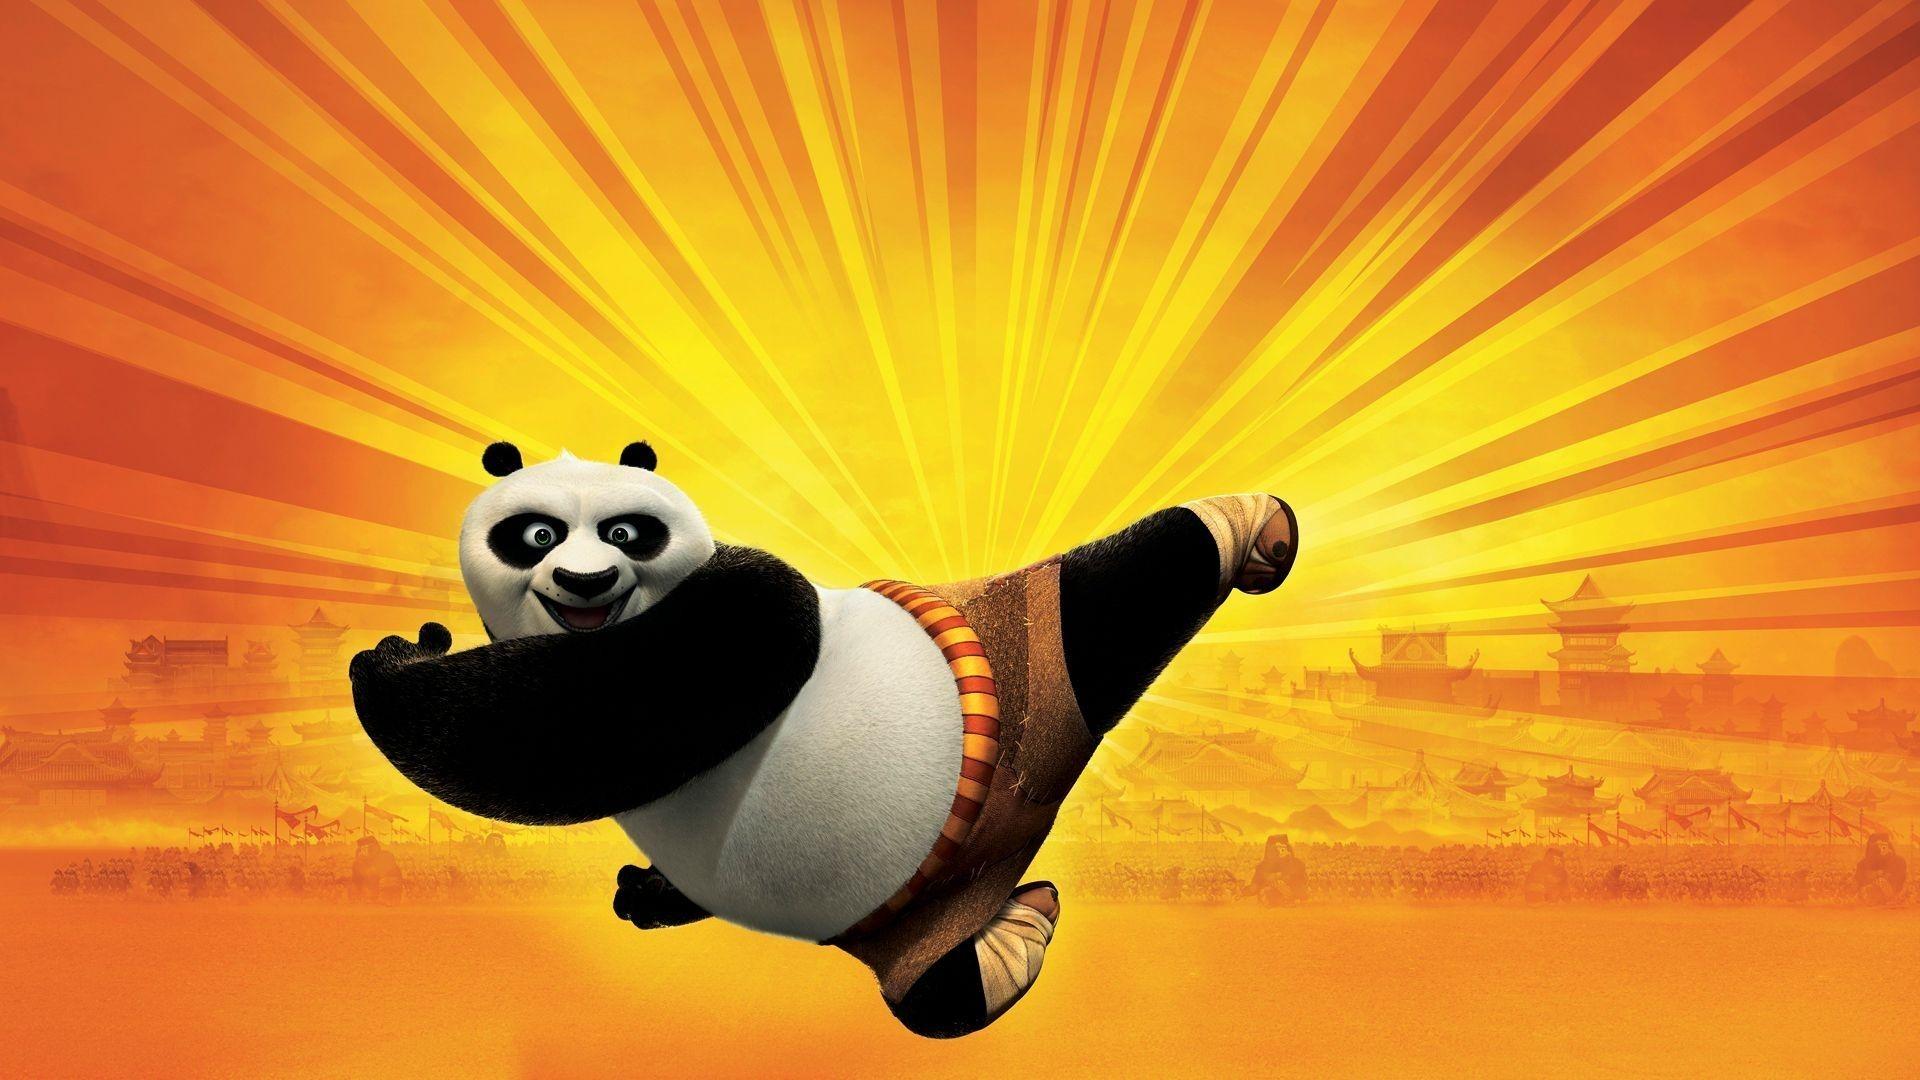 Kung Fu Panda 1920x1080 wallpaper